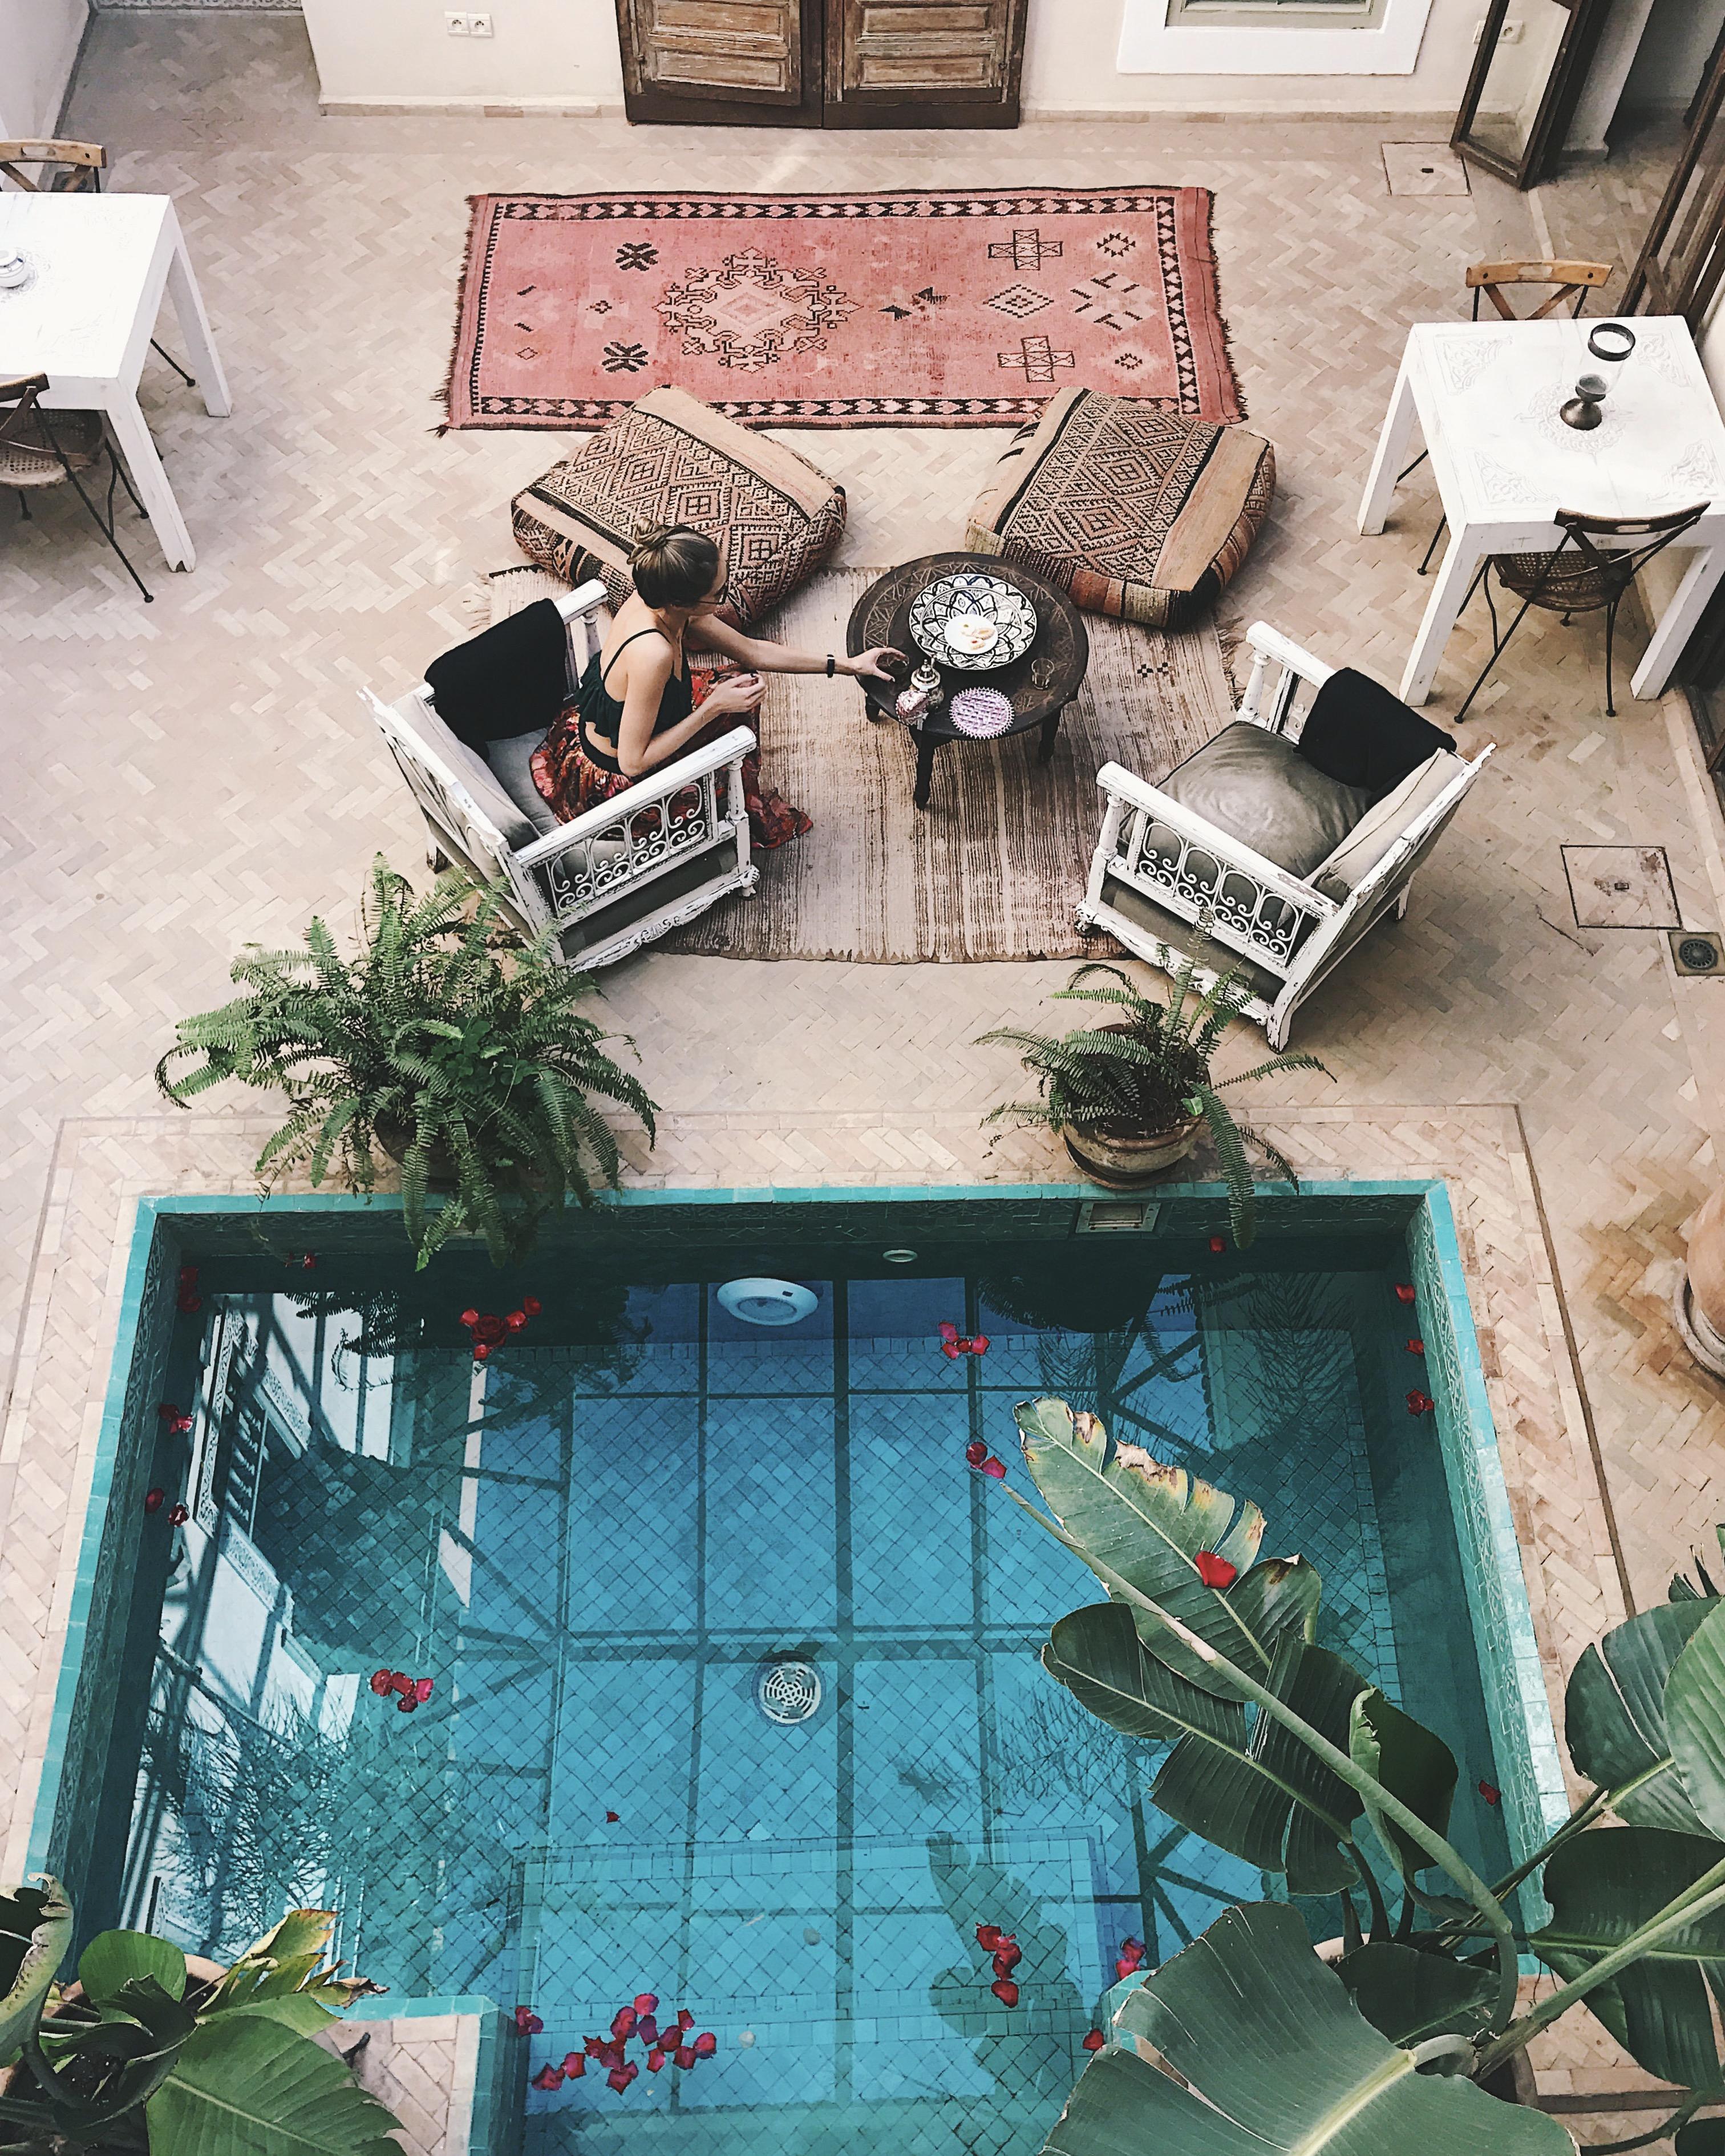 linda_tsetis_worlds_affair_marrakech_riad_palacio_de_las_especias